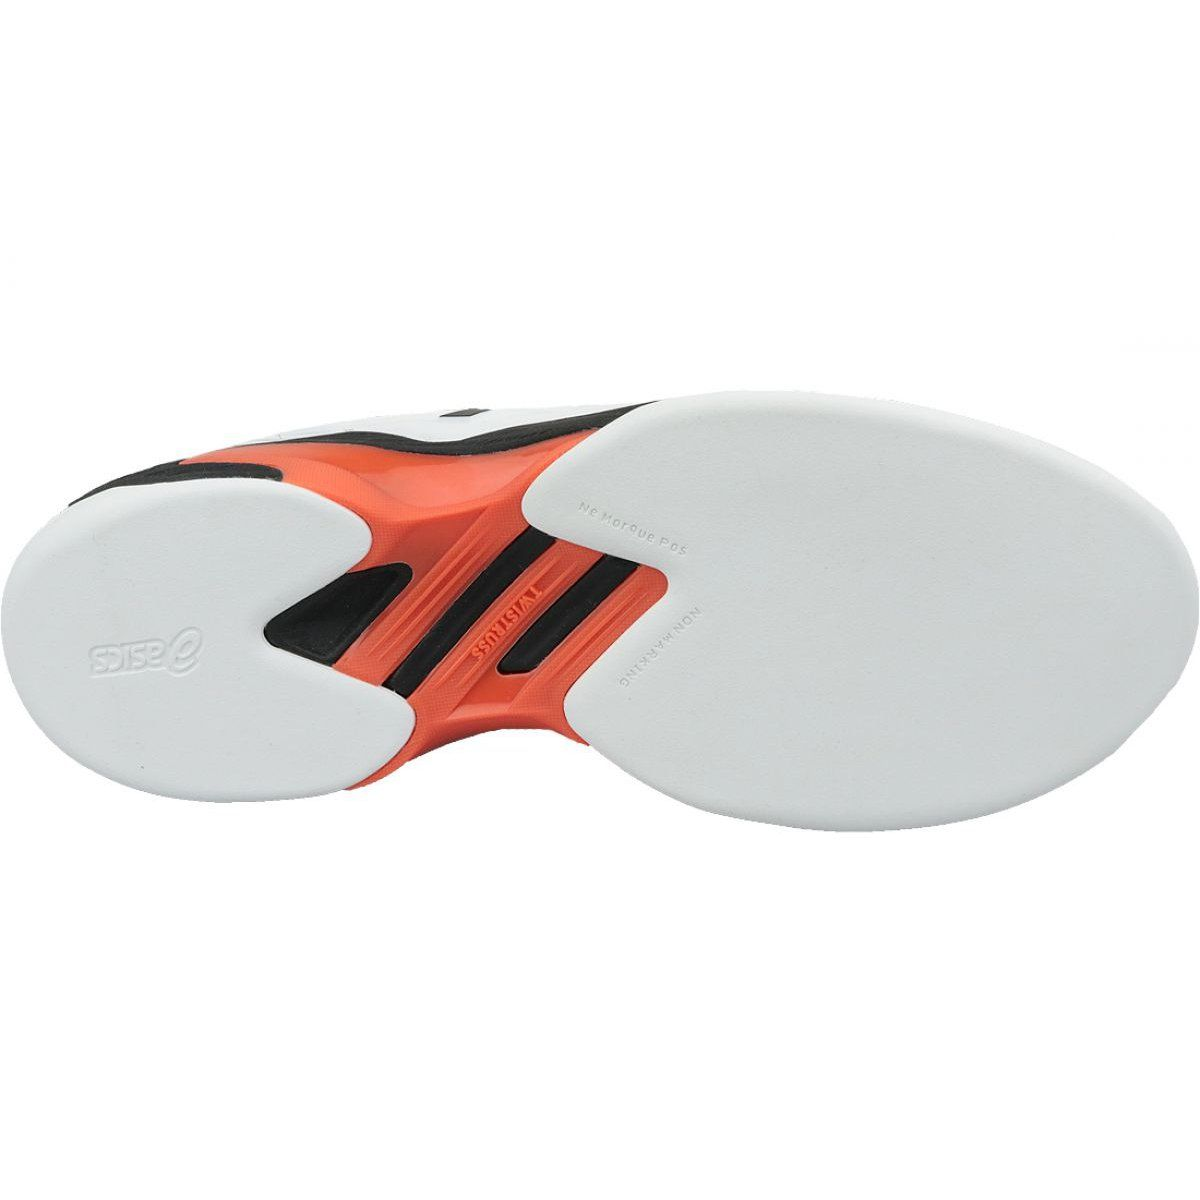 Tennis Sport Asics Asics Solution Speed Ff Indoor M 1041a110 102 Tennis Shoes White Asics Asics Men Tennis Shoes